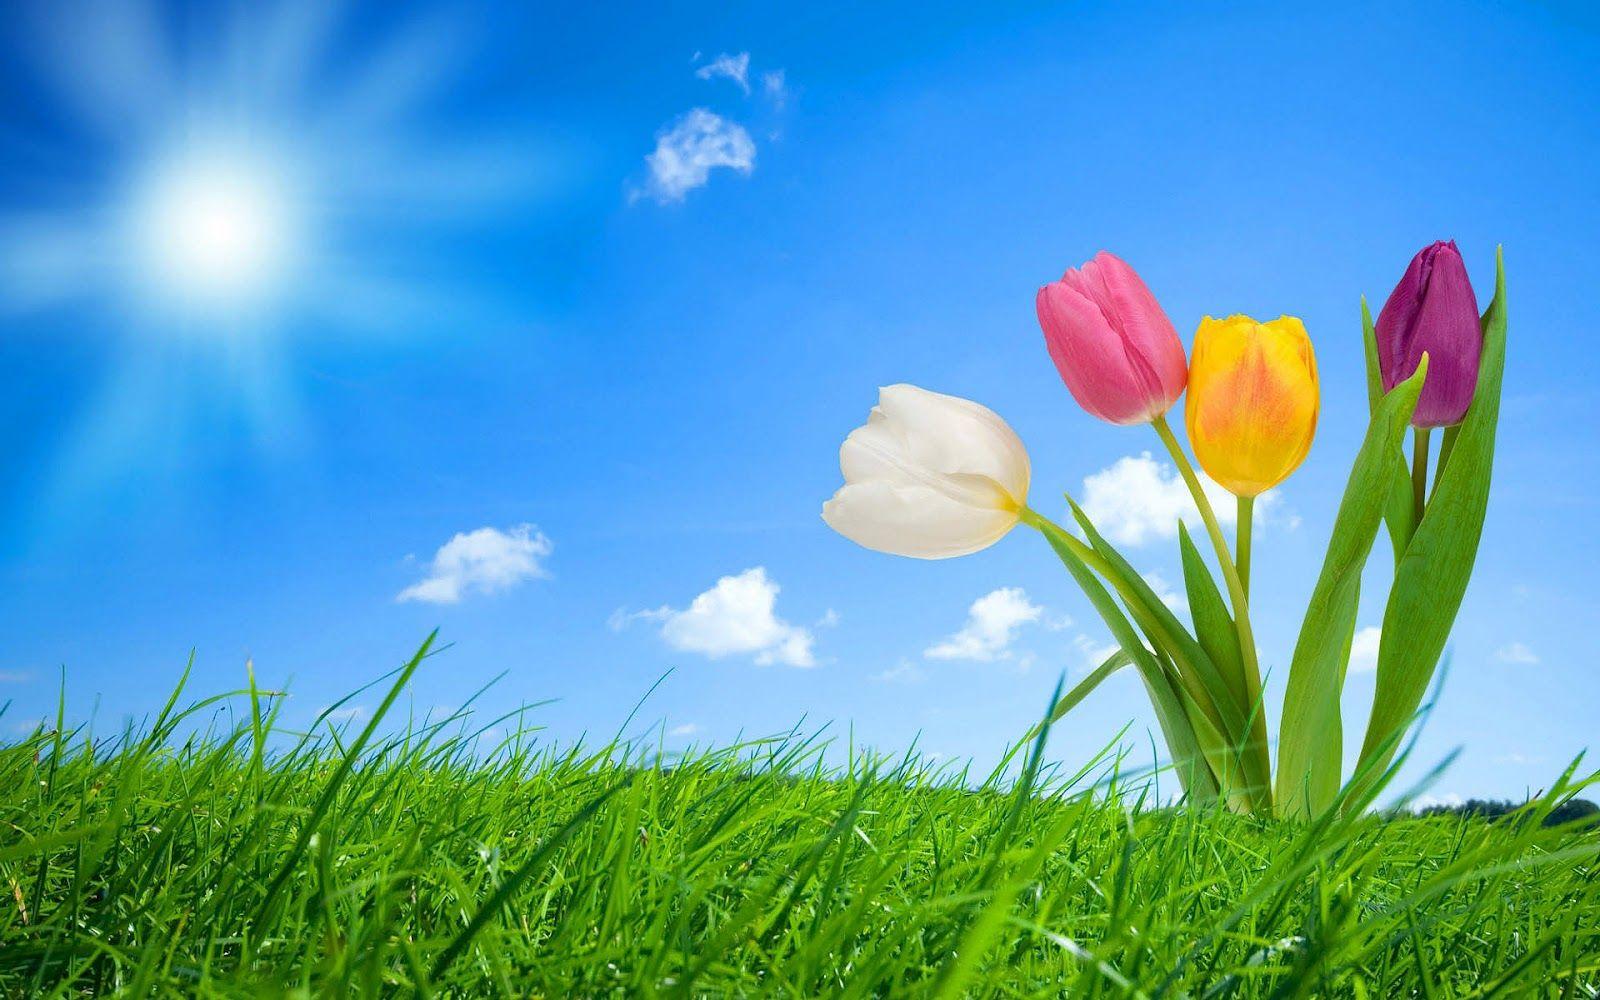 spring pictures for desktop Best top desktop spring wallpapers 1600x1000